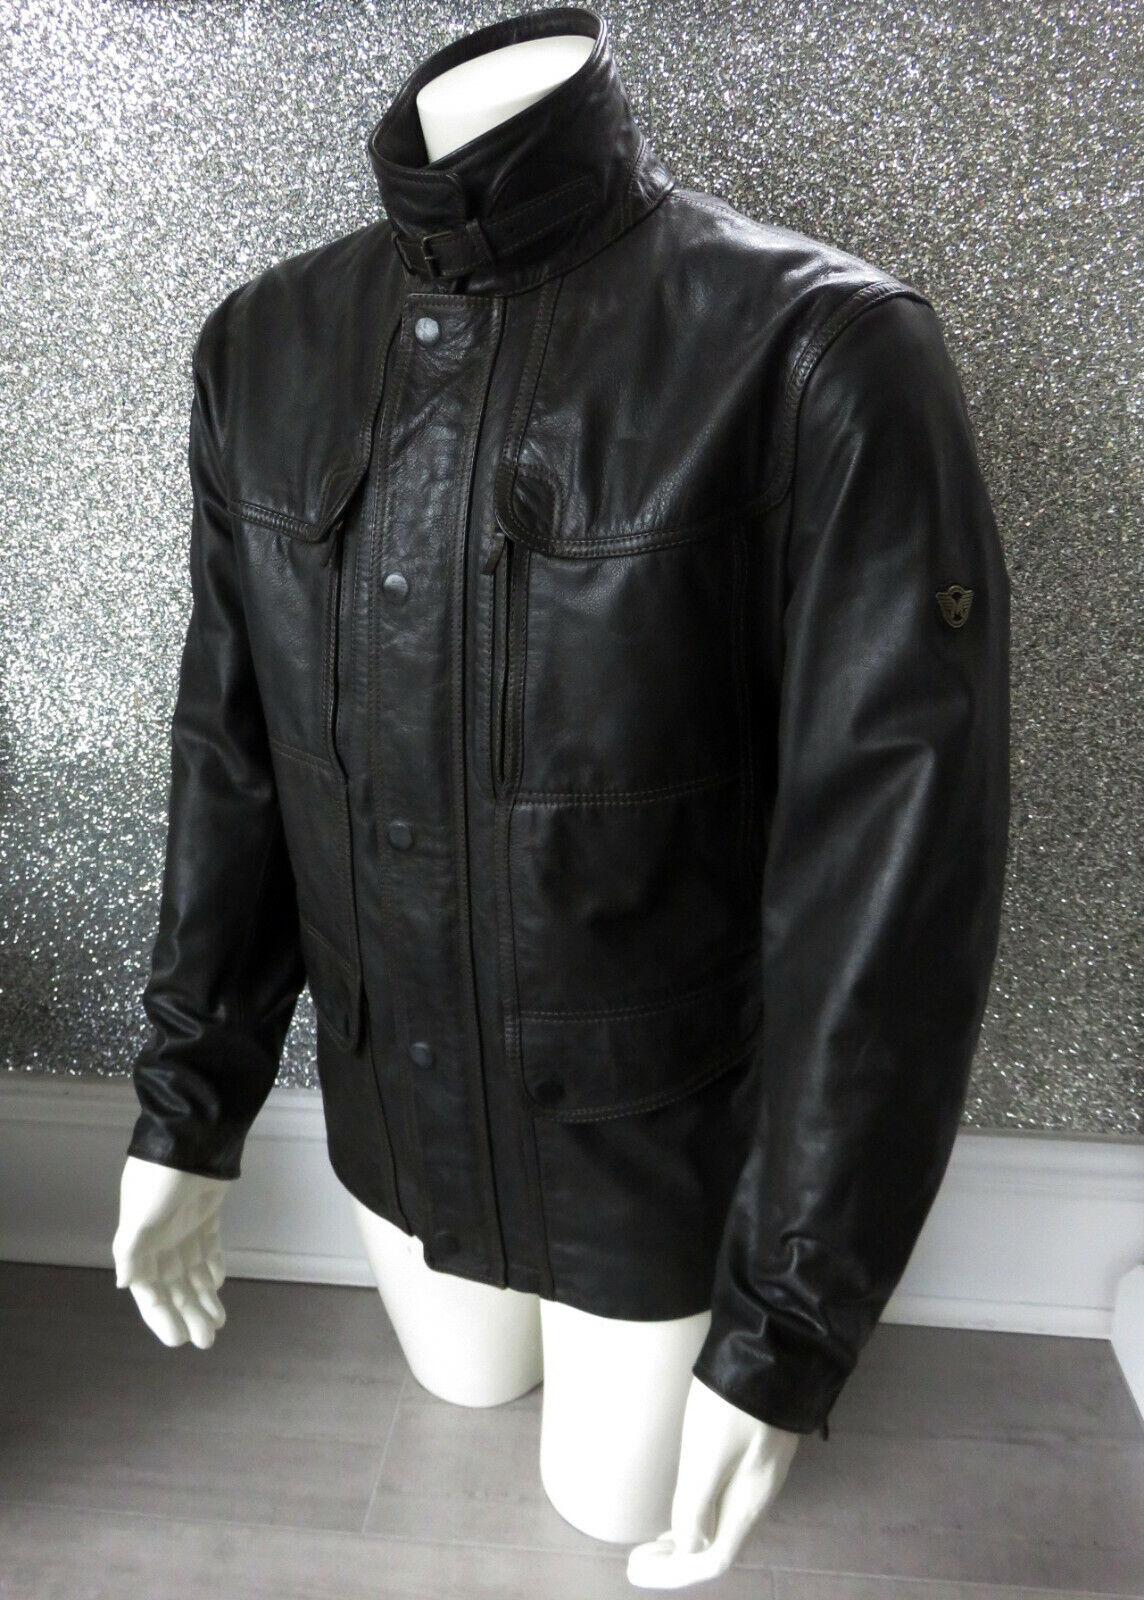 Kensington Evolution Negro Chaqueta De Cuero inigualable que 54 XXL RRP 1200